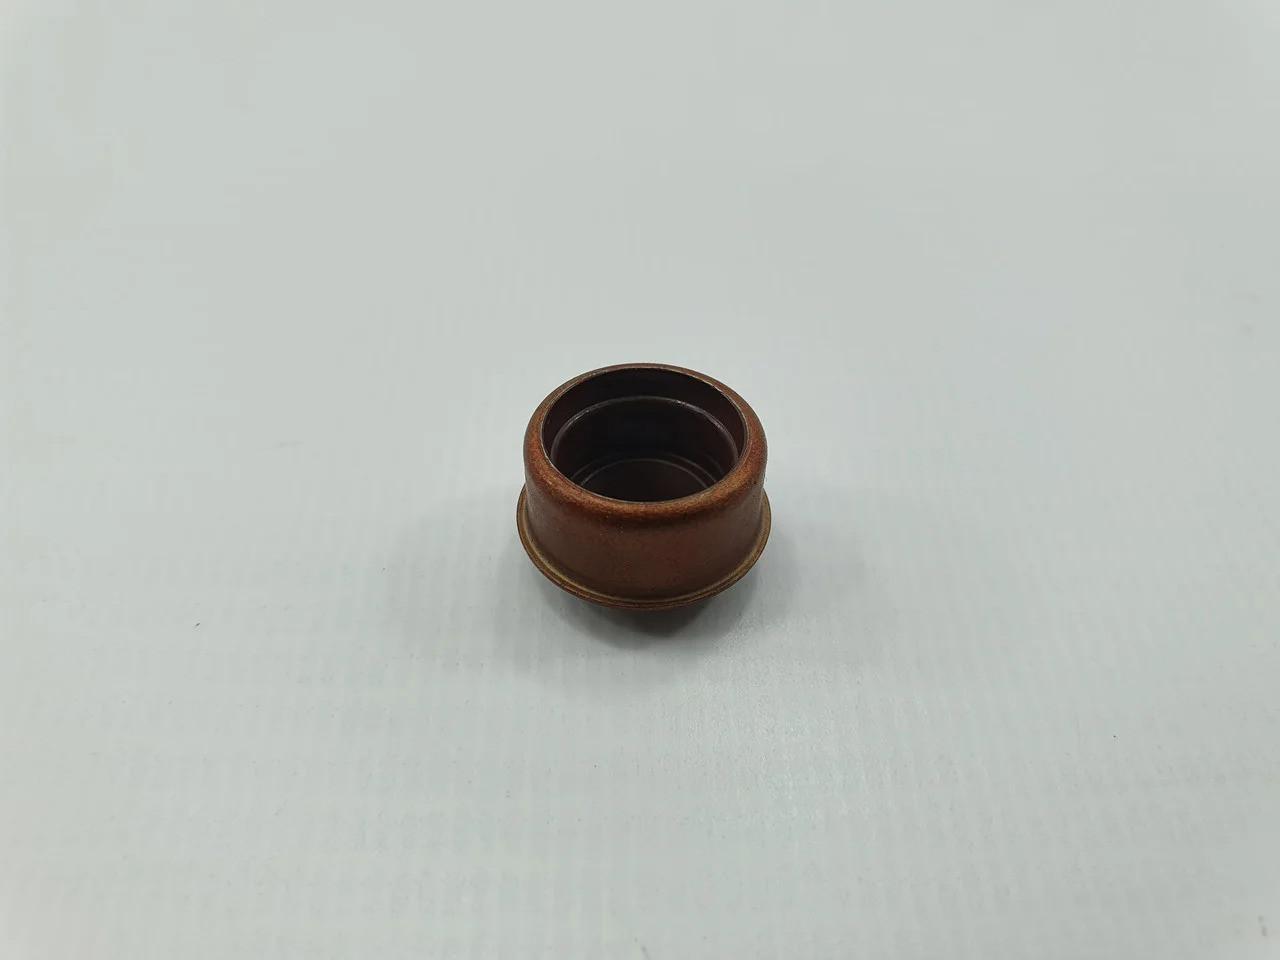 Сальник клапана Ланос 1.5 GROG Корея